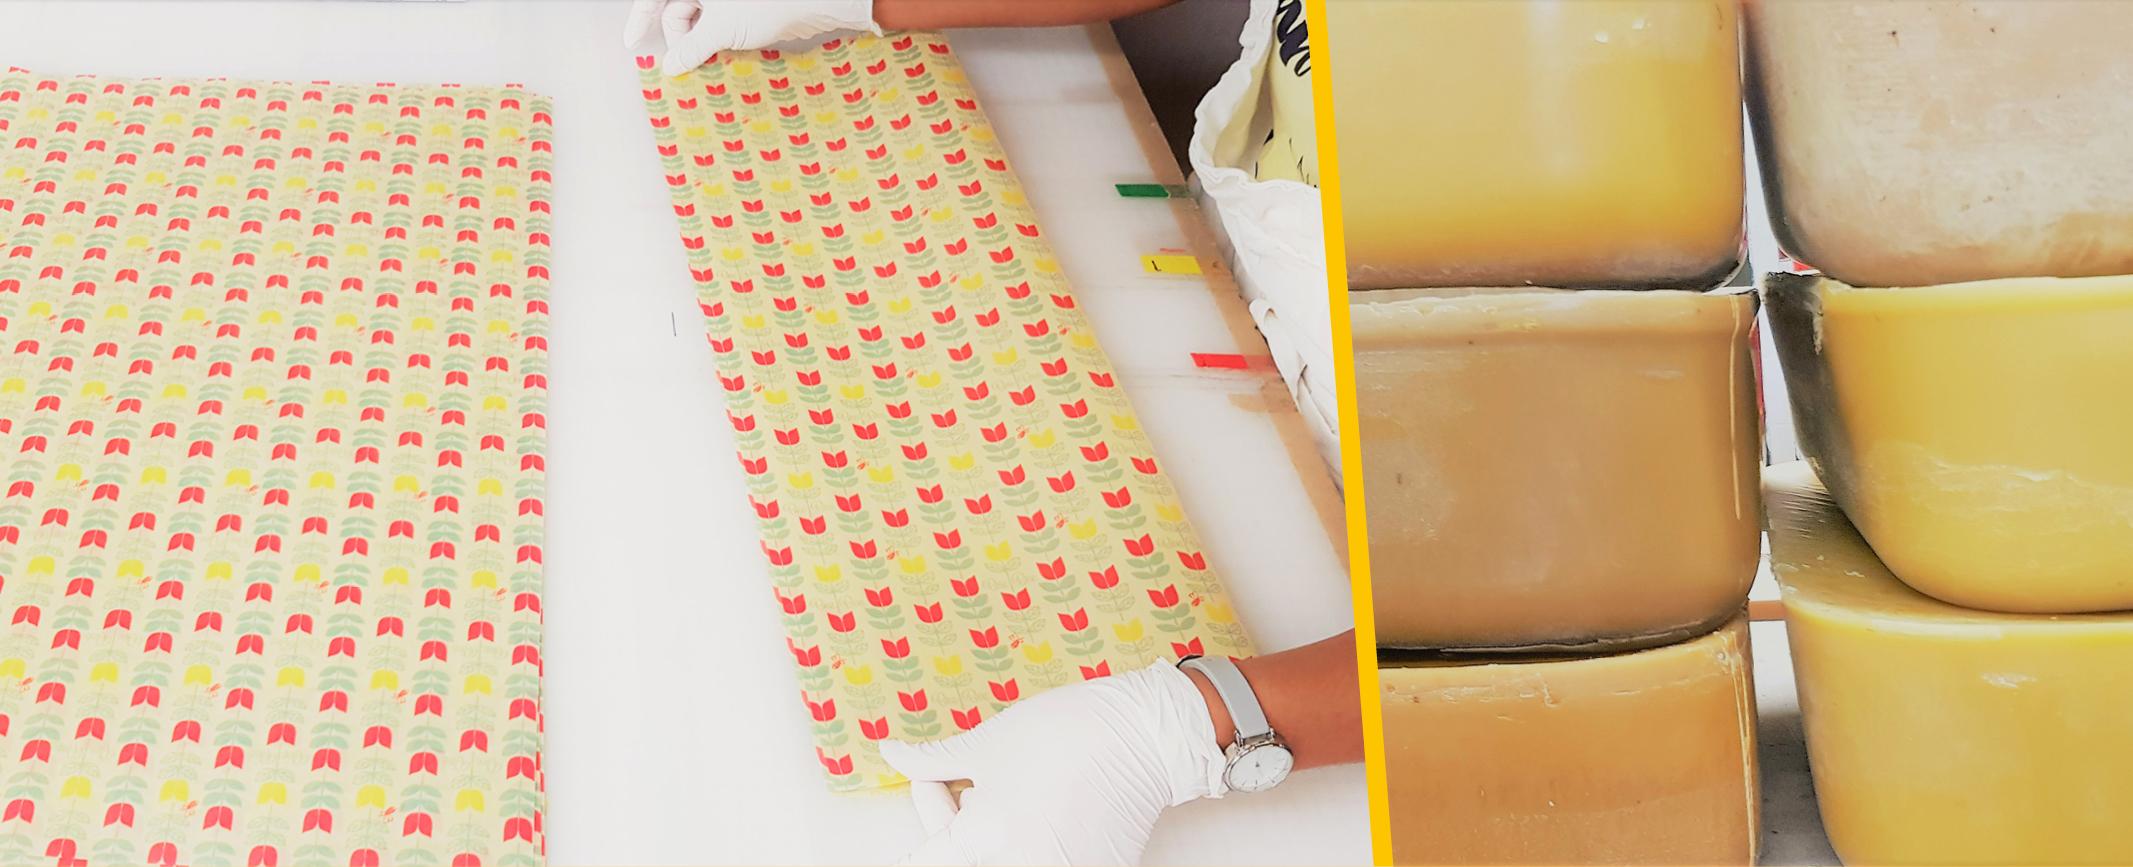 Wax wrap making